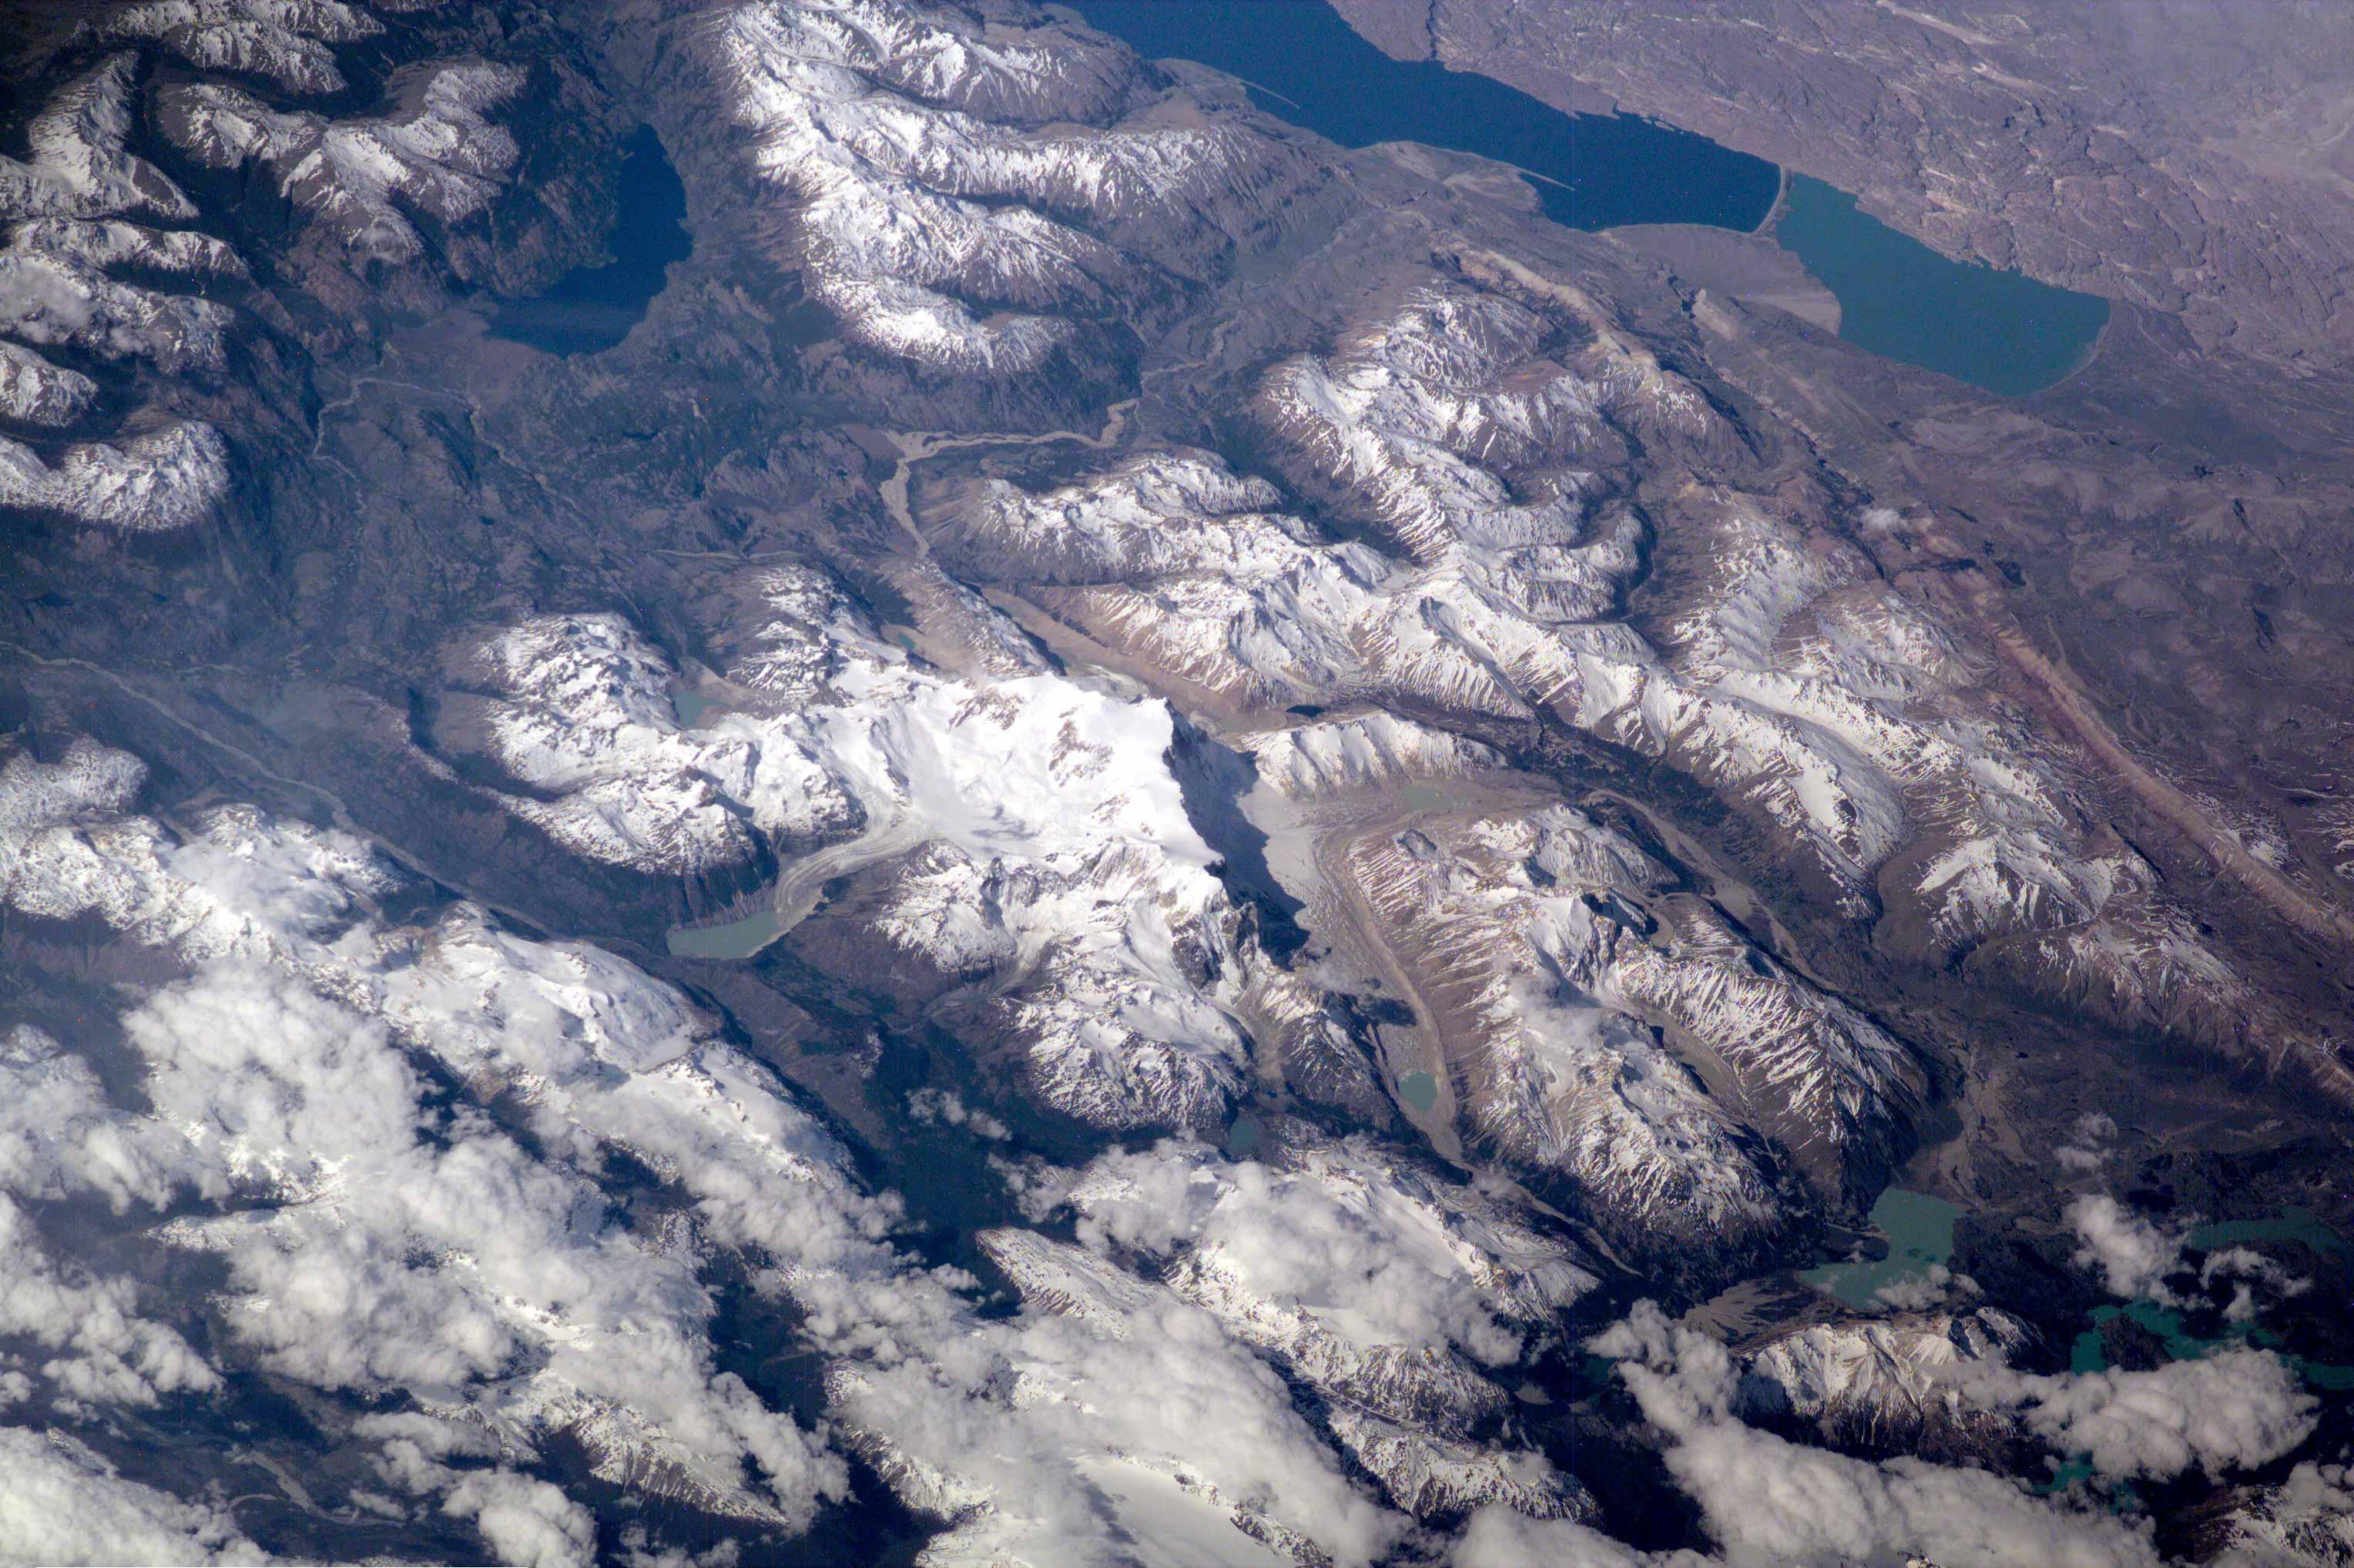 ice erosion pictures - photo #8